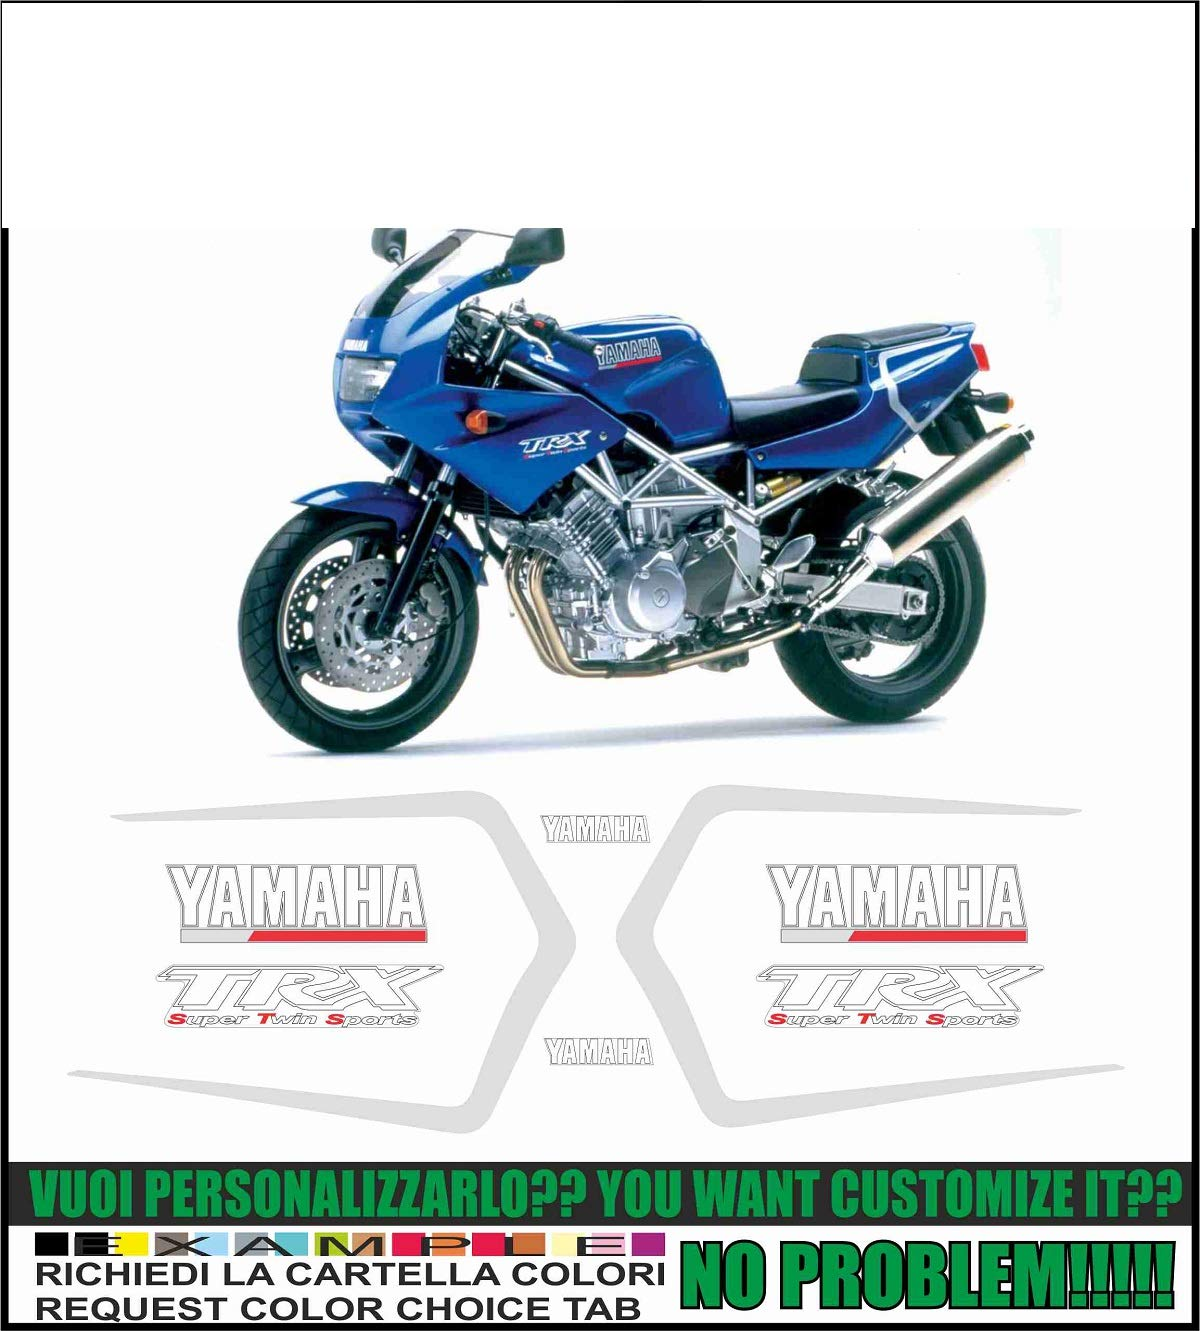 Kit adesivi Decal Stickers Yamaha TRX 850 1996: Amazon.es: Coche y moto